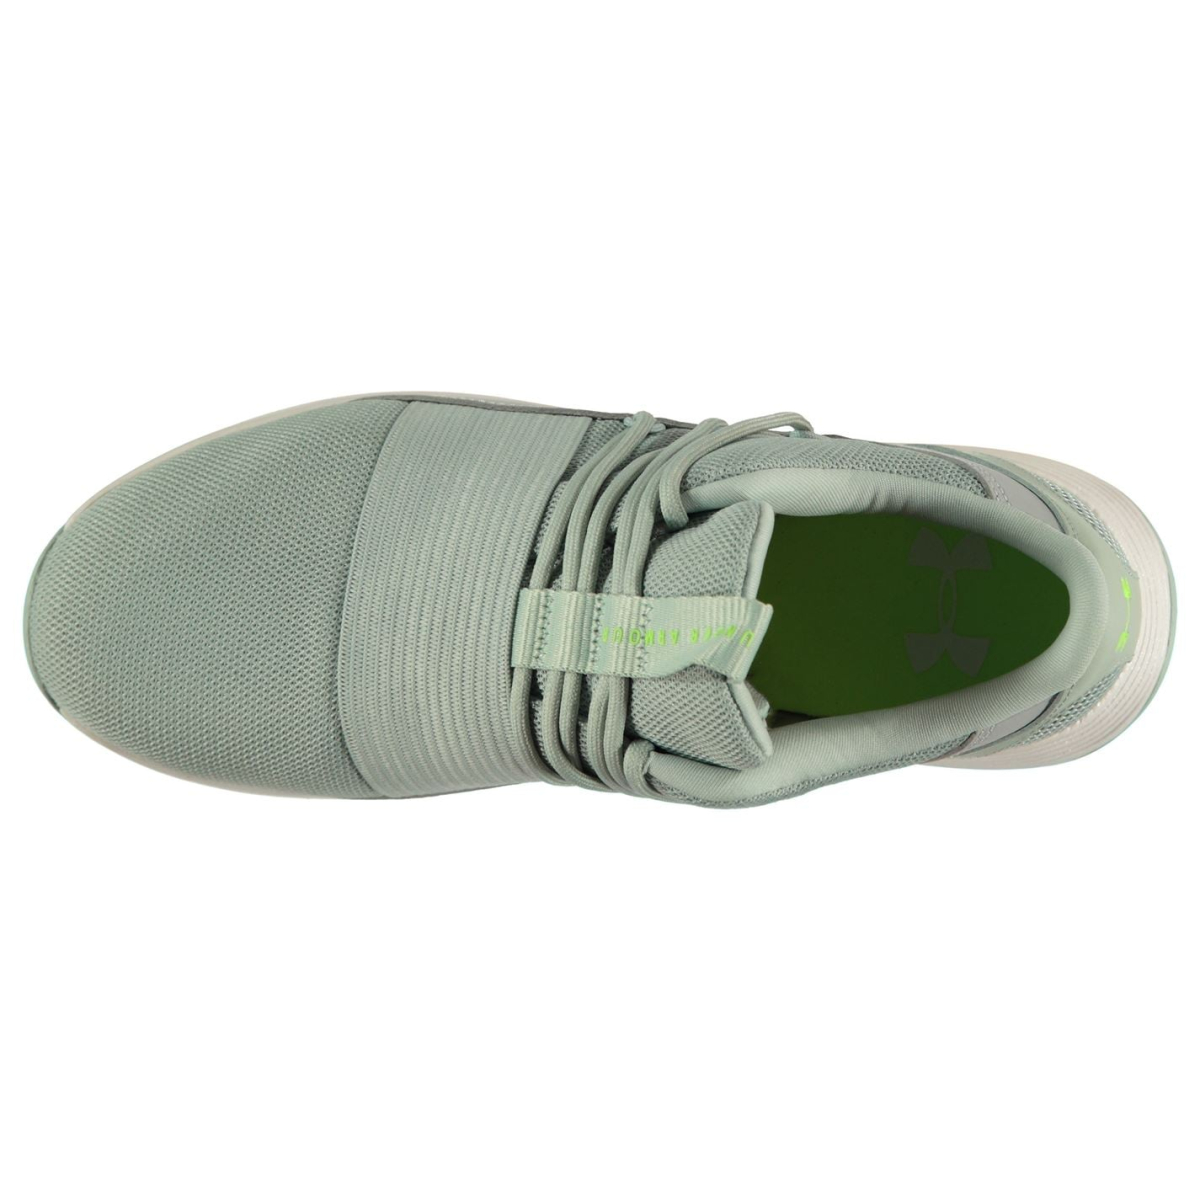 Under-Armour-Breathe-Glitz-Turnschuhe-Damen-Sneaker-Sportschuhe-Laufschuhe-1451 Indexbild 4